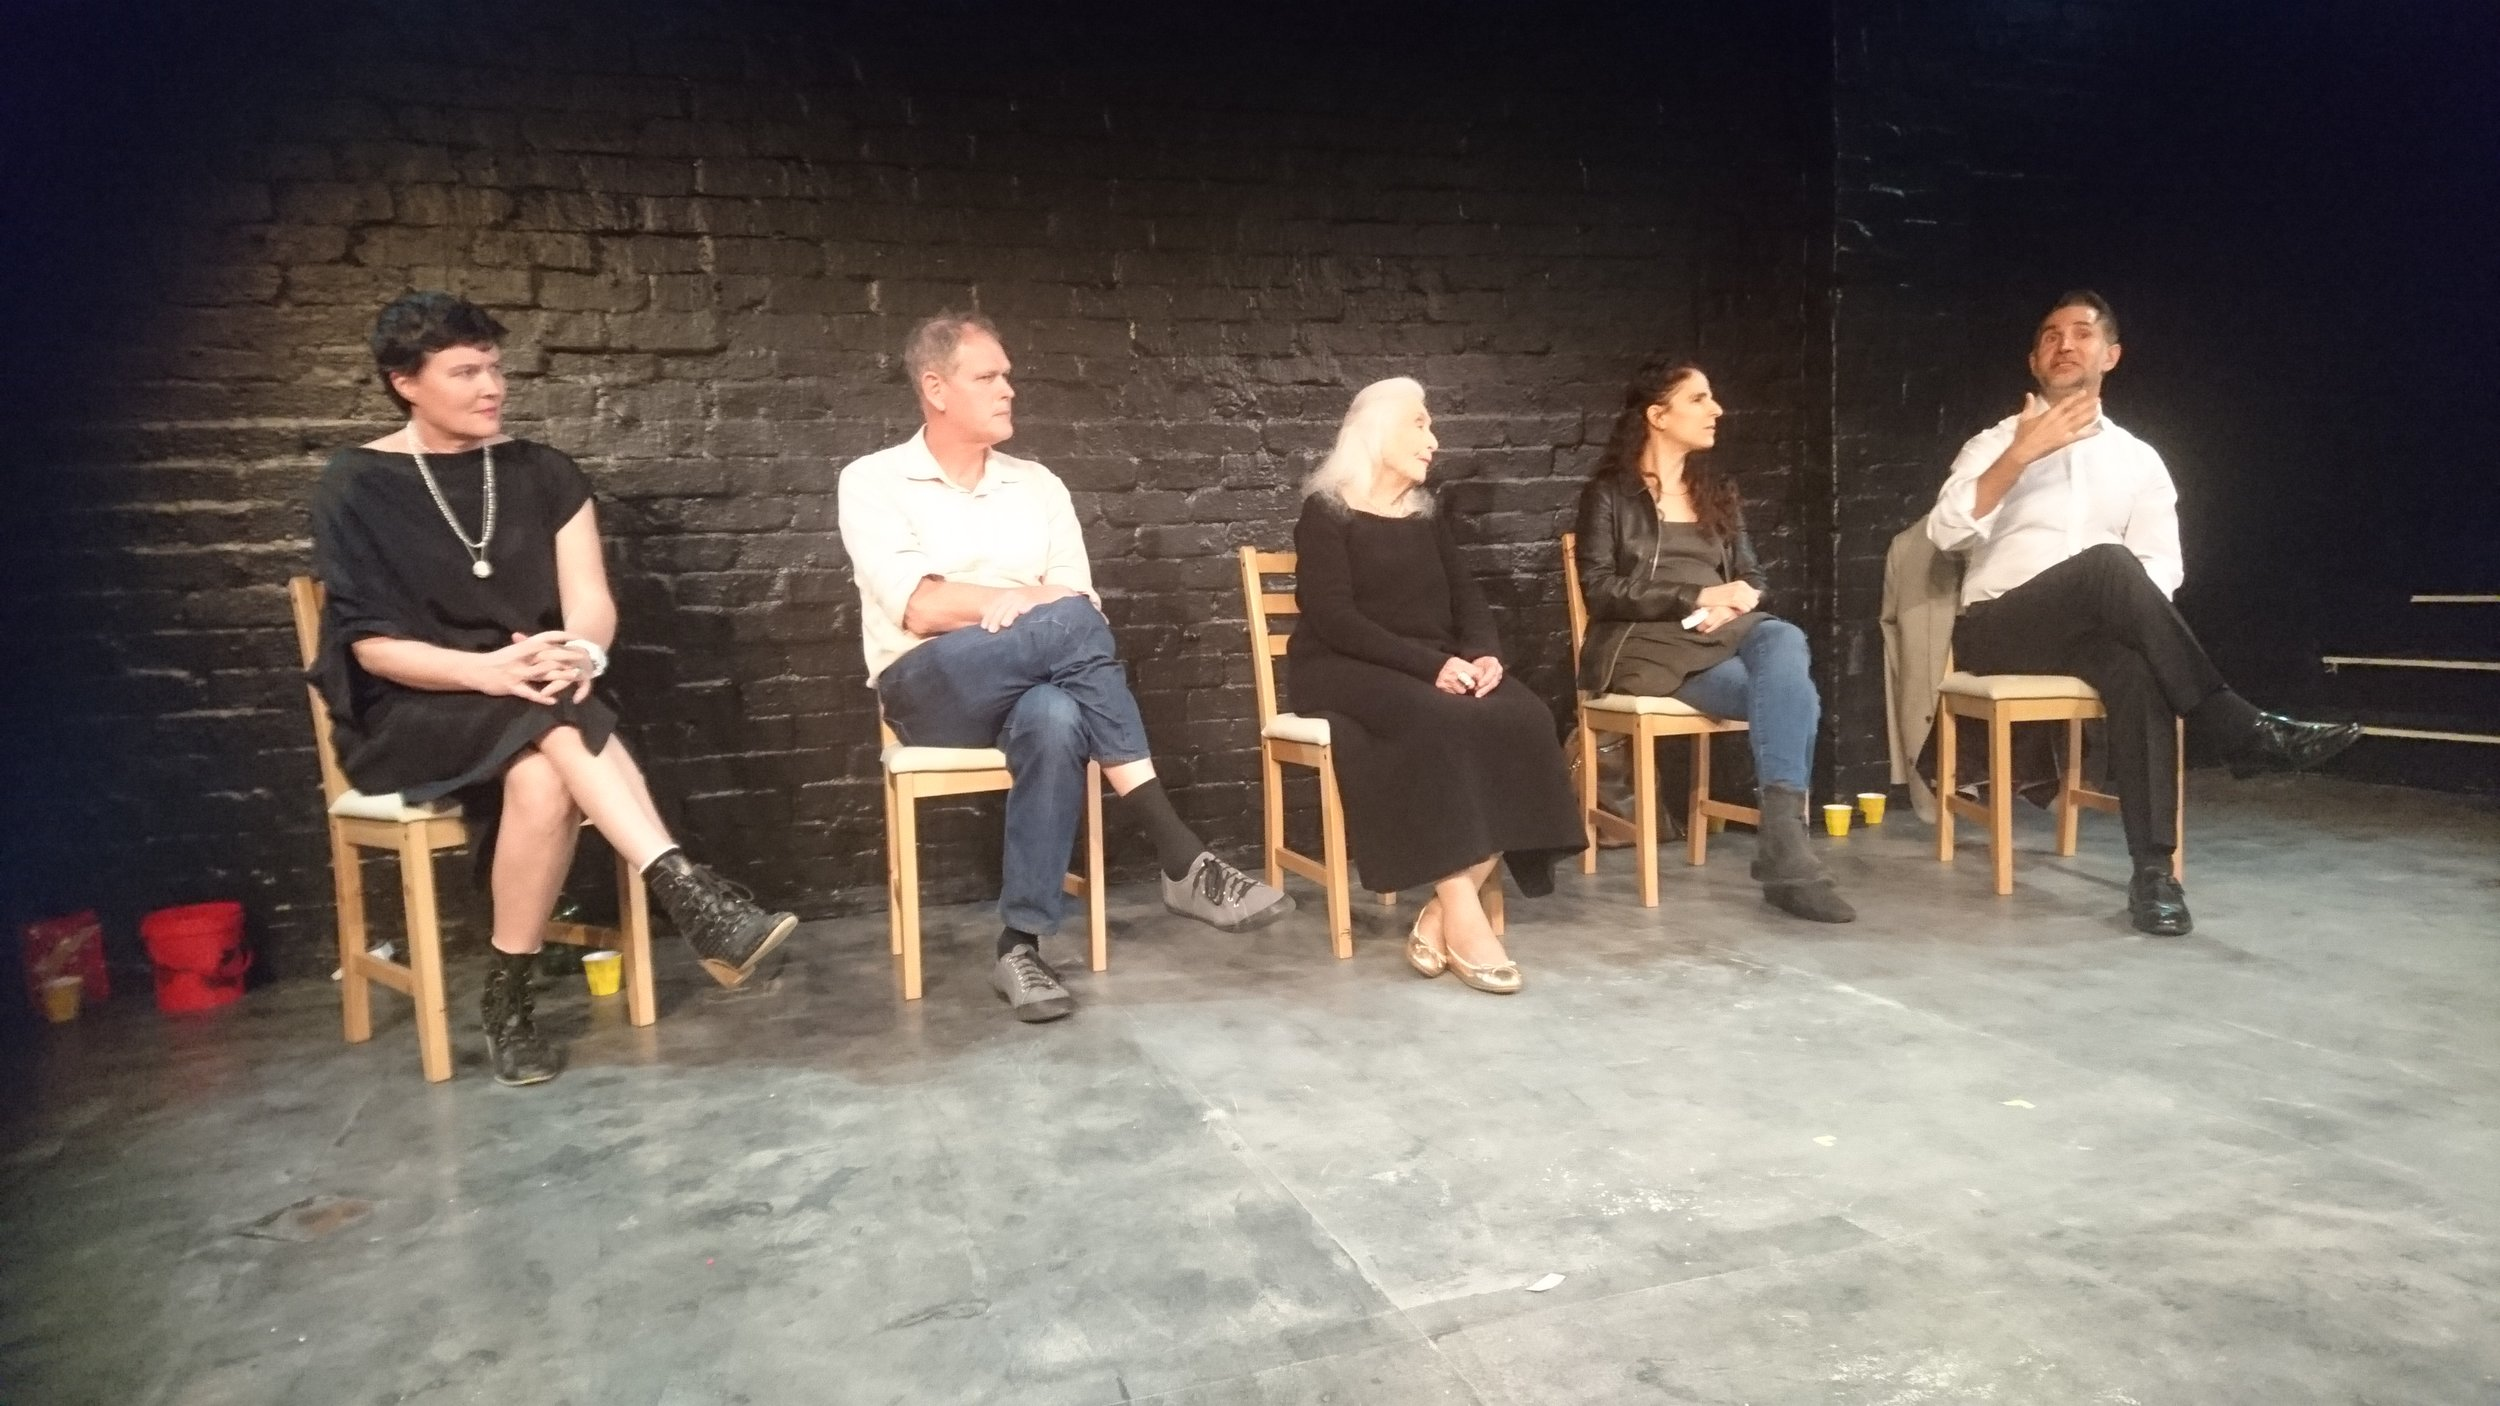 Jackie Dent, Martin Samson, Eileen Kramer and Talia Morag listening to Terry Samaras.